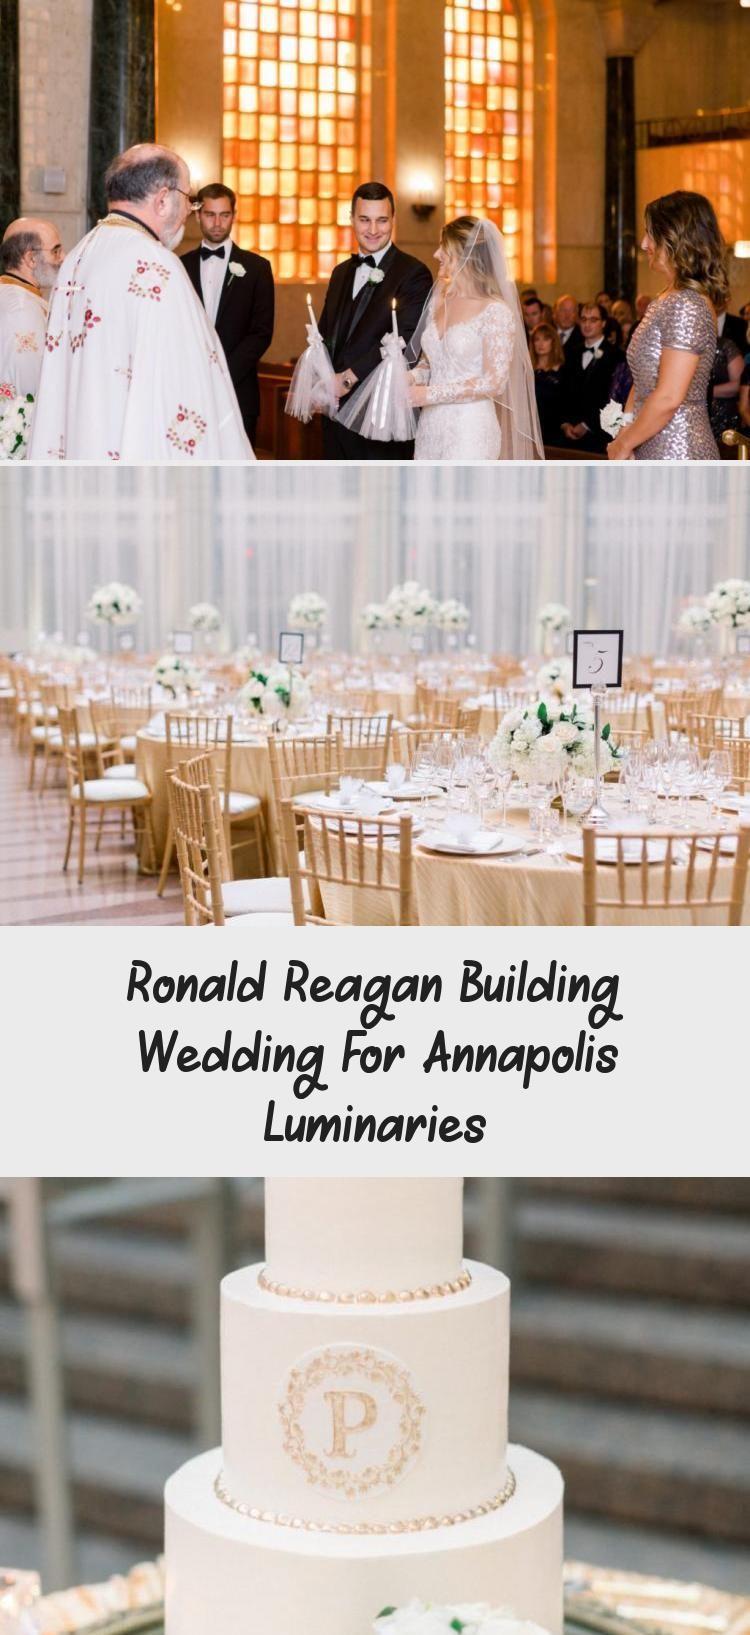 Ronald Reagan Building Wedding For Annapolis Luminaries in